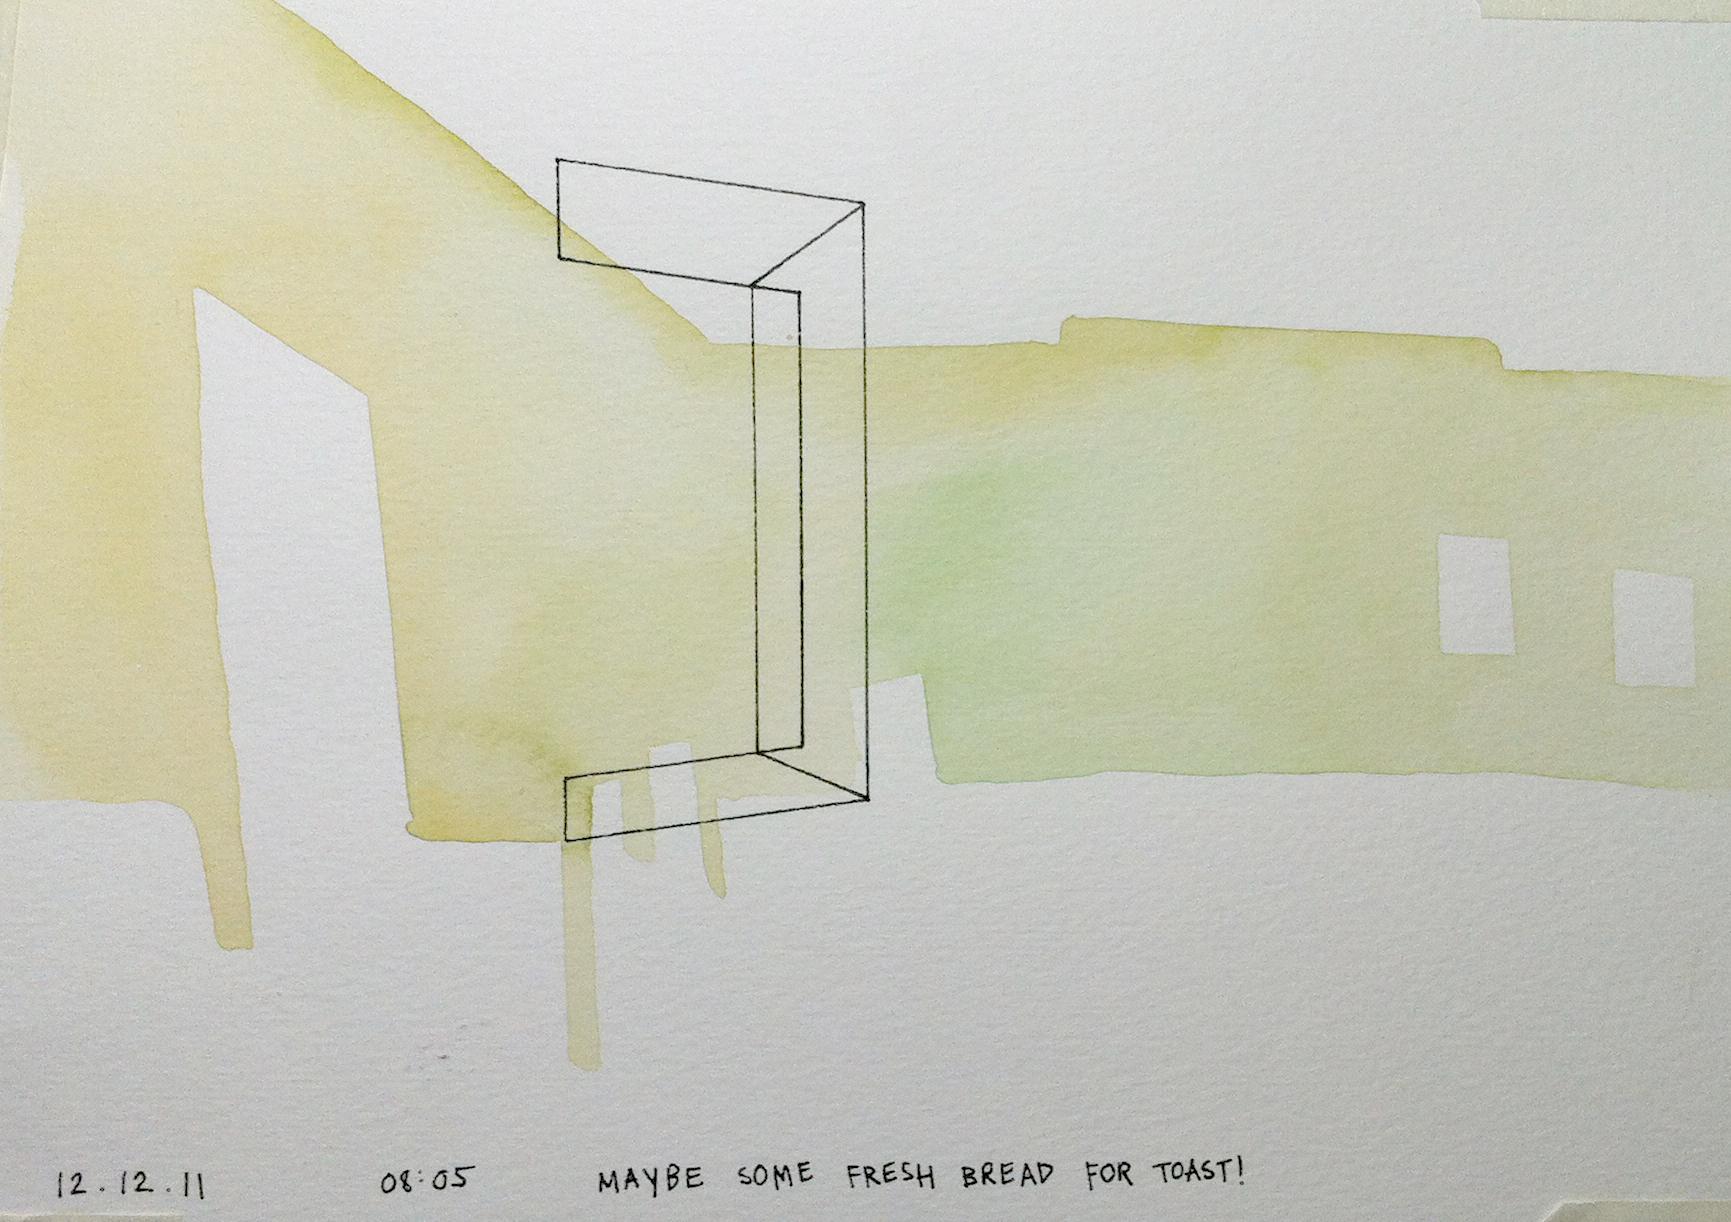 2011-11-25 drawing03.jpg